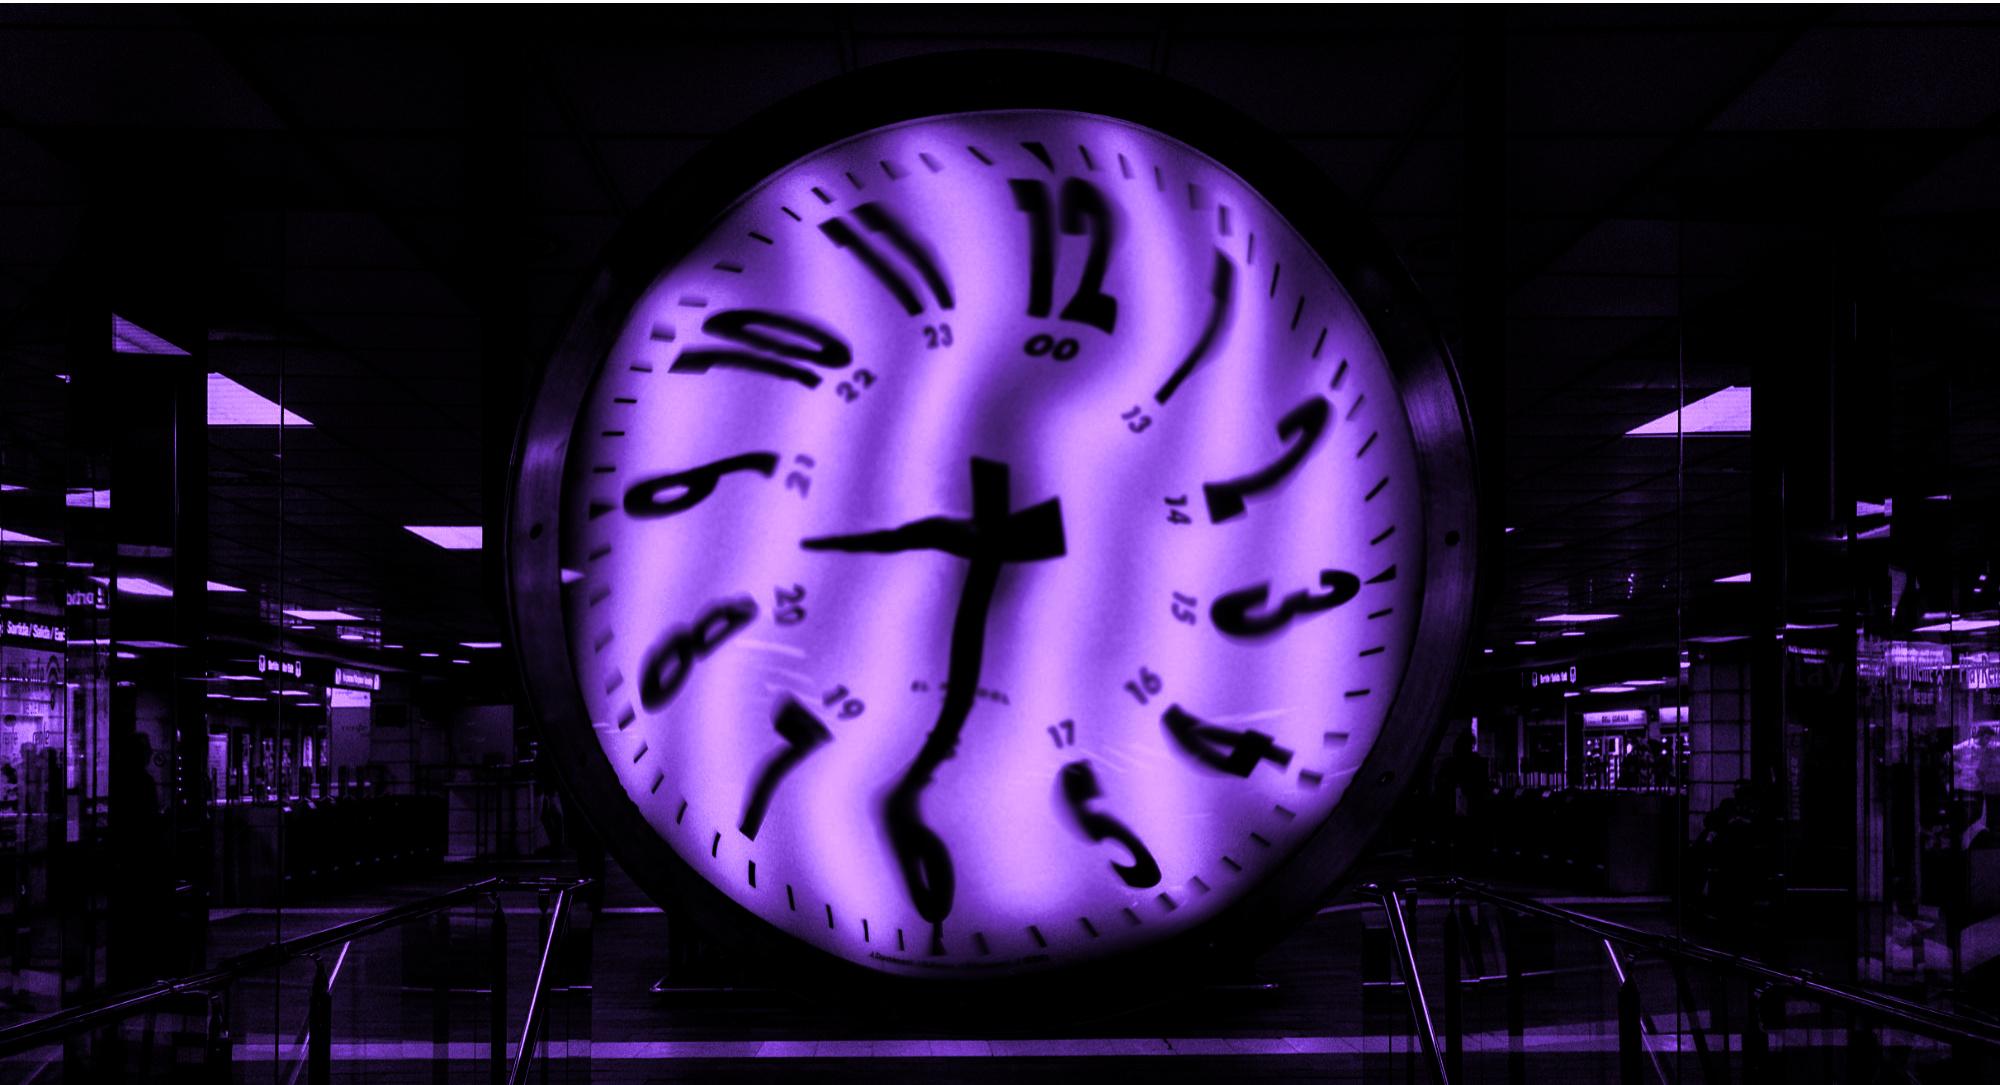 Episode 51 – Time Slips